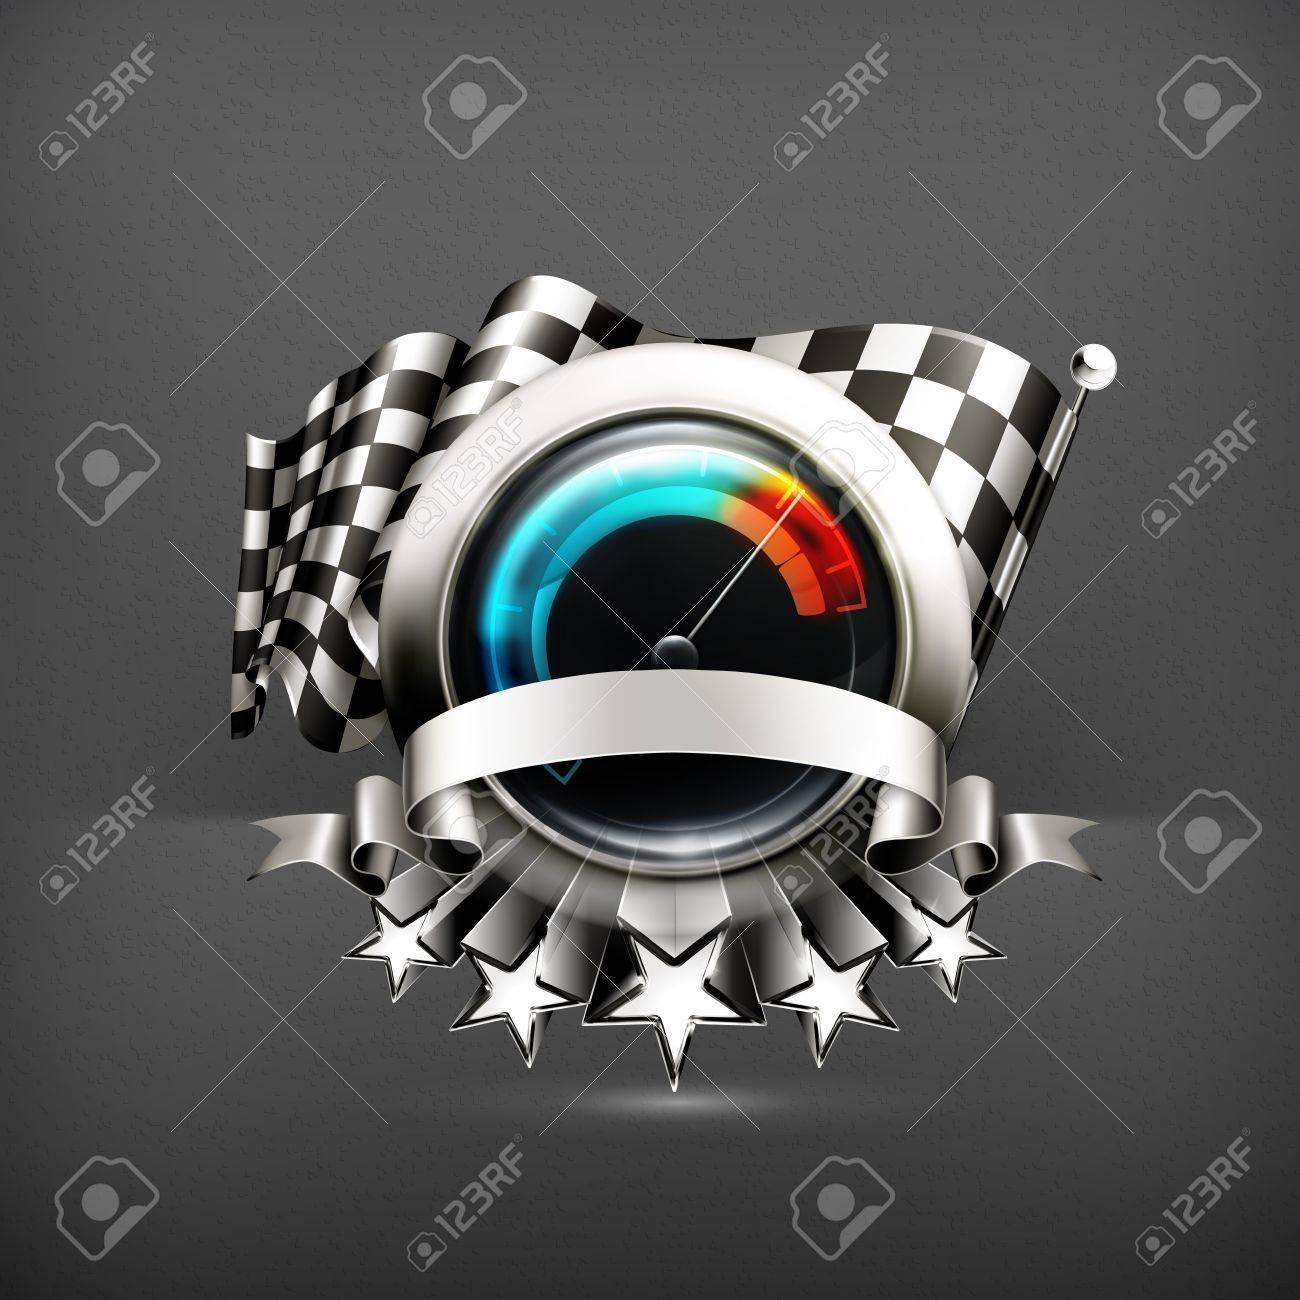 Racing emblem Stock Vector - 19556372